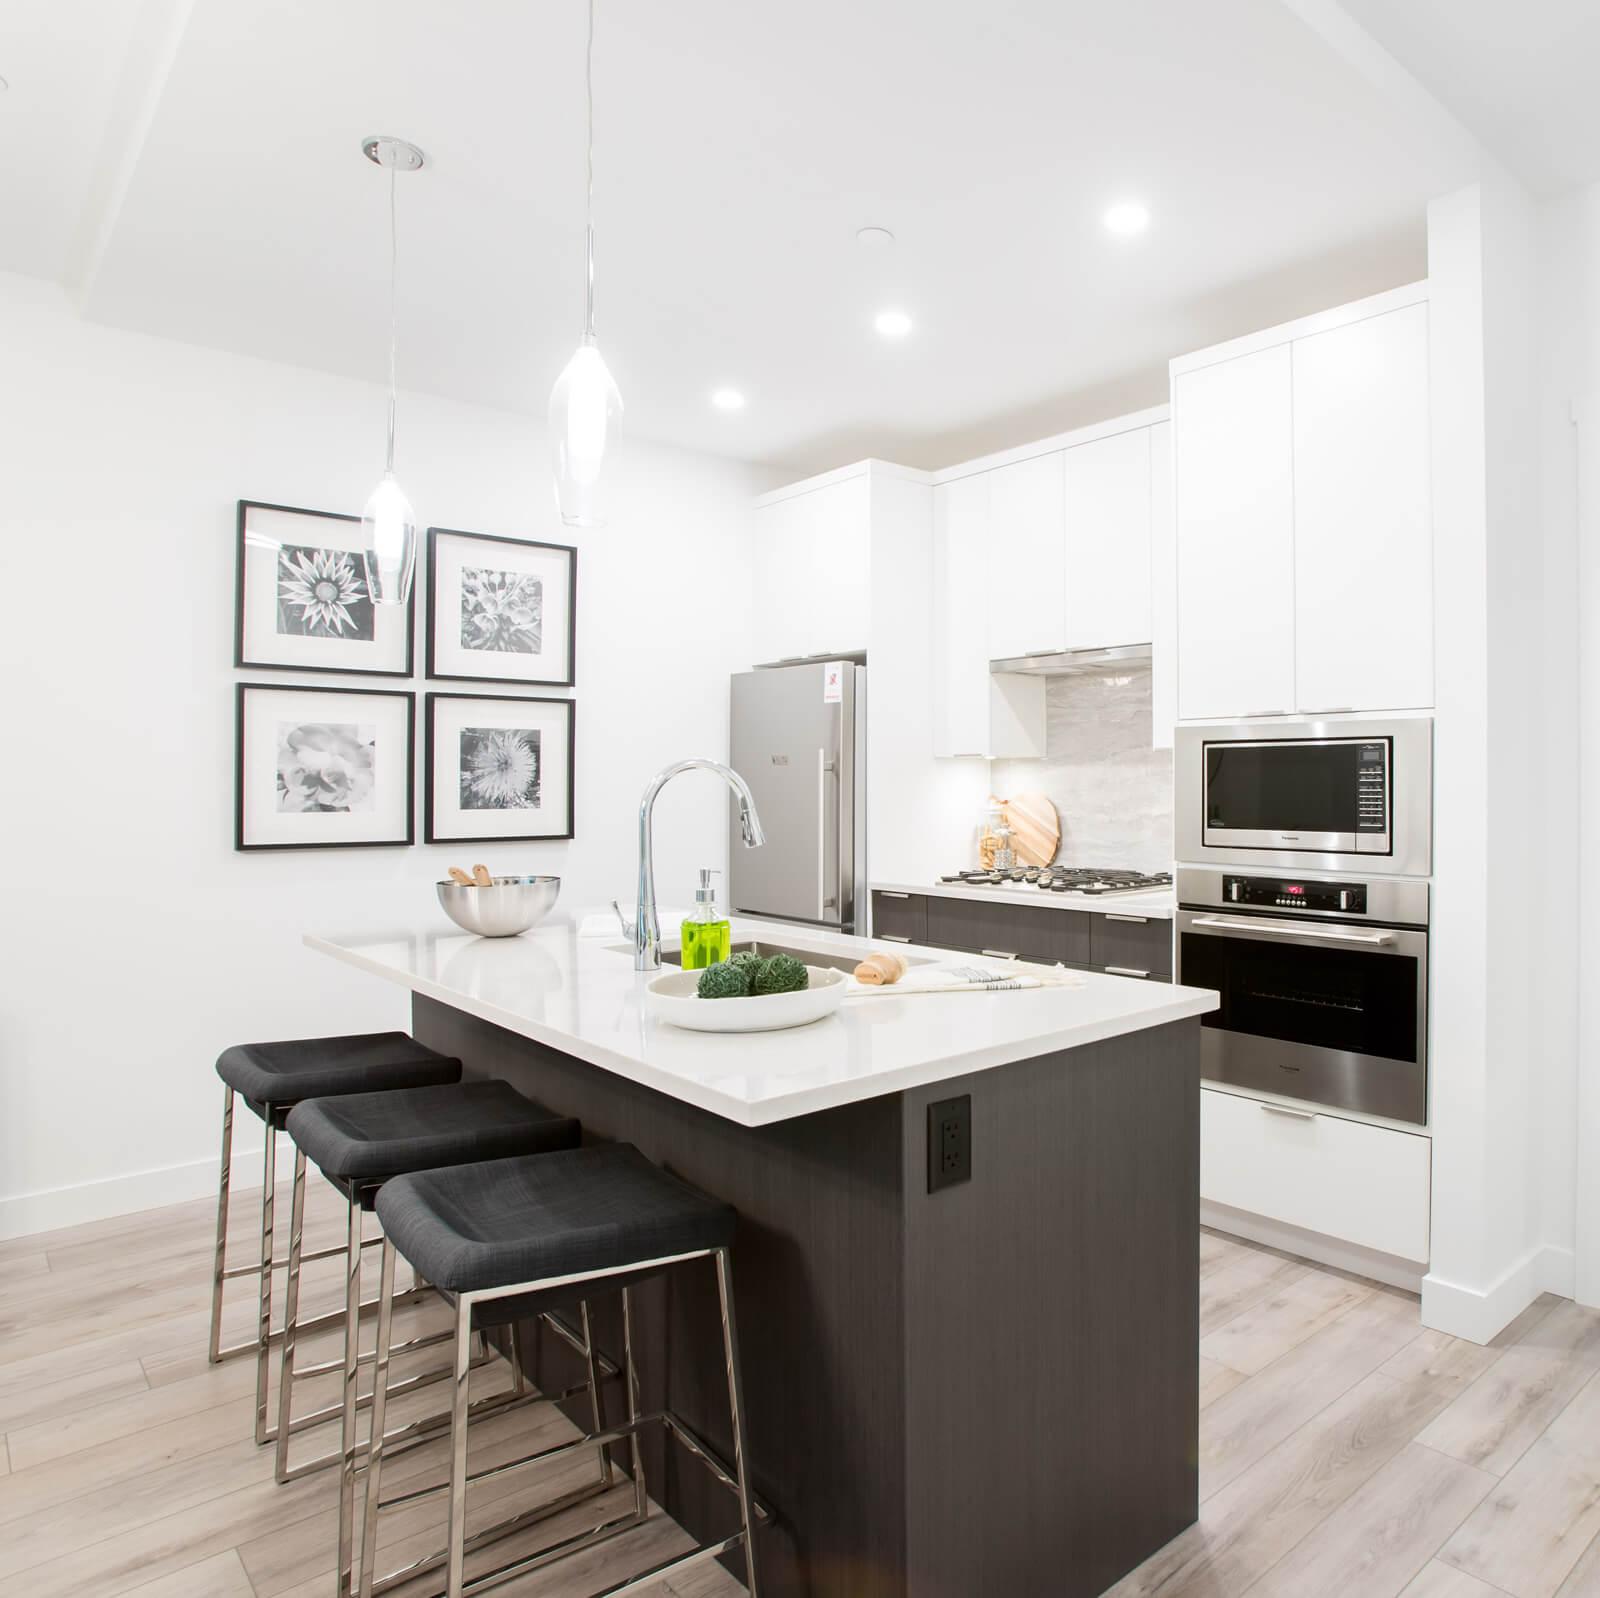 https://highpointeliving.ca/wp-content/uploads/2019/07/Model-kitchen.jpg